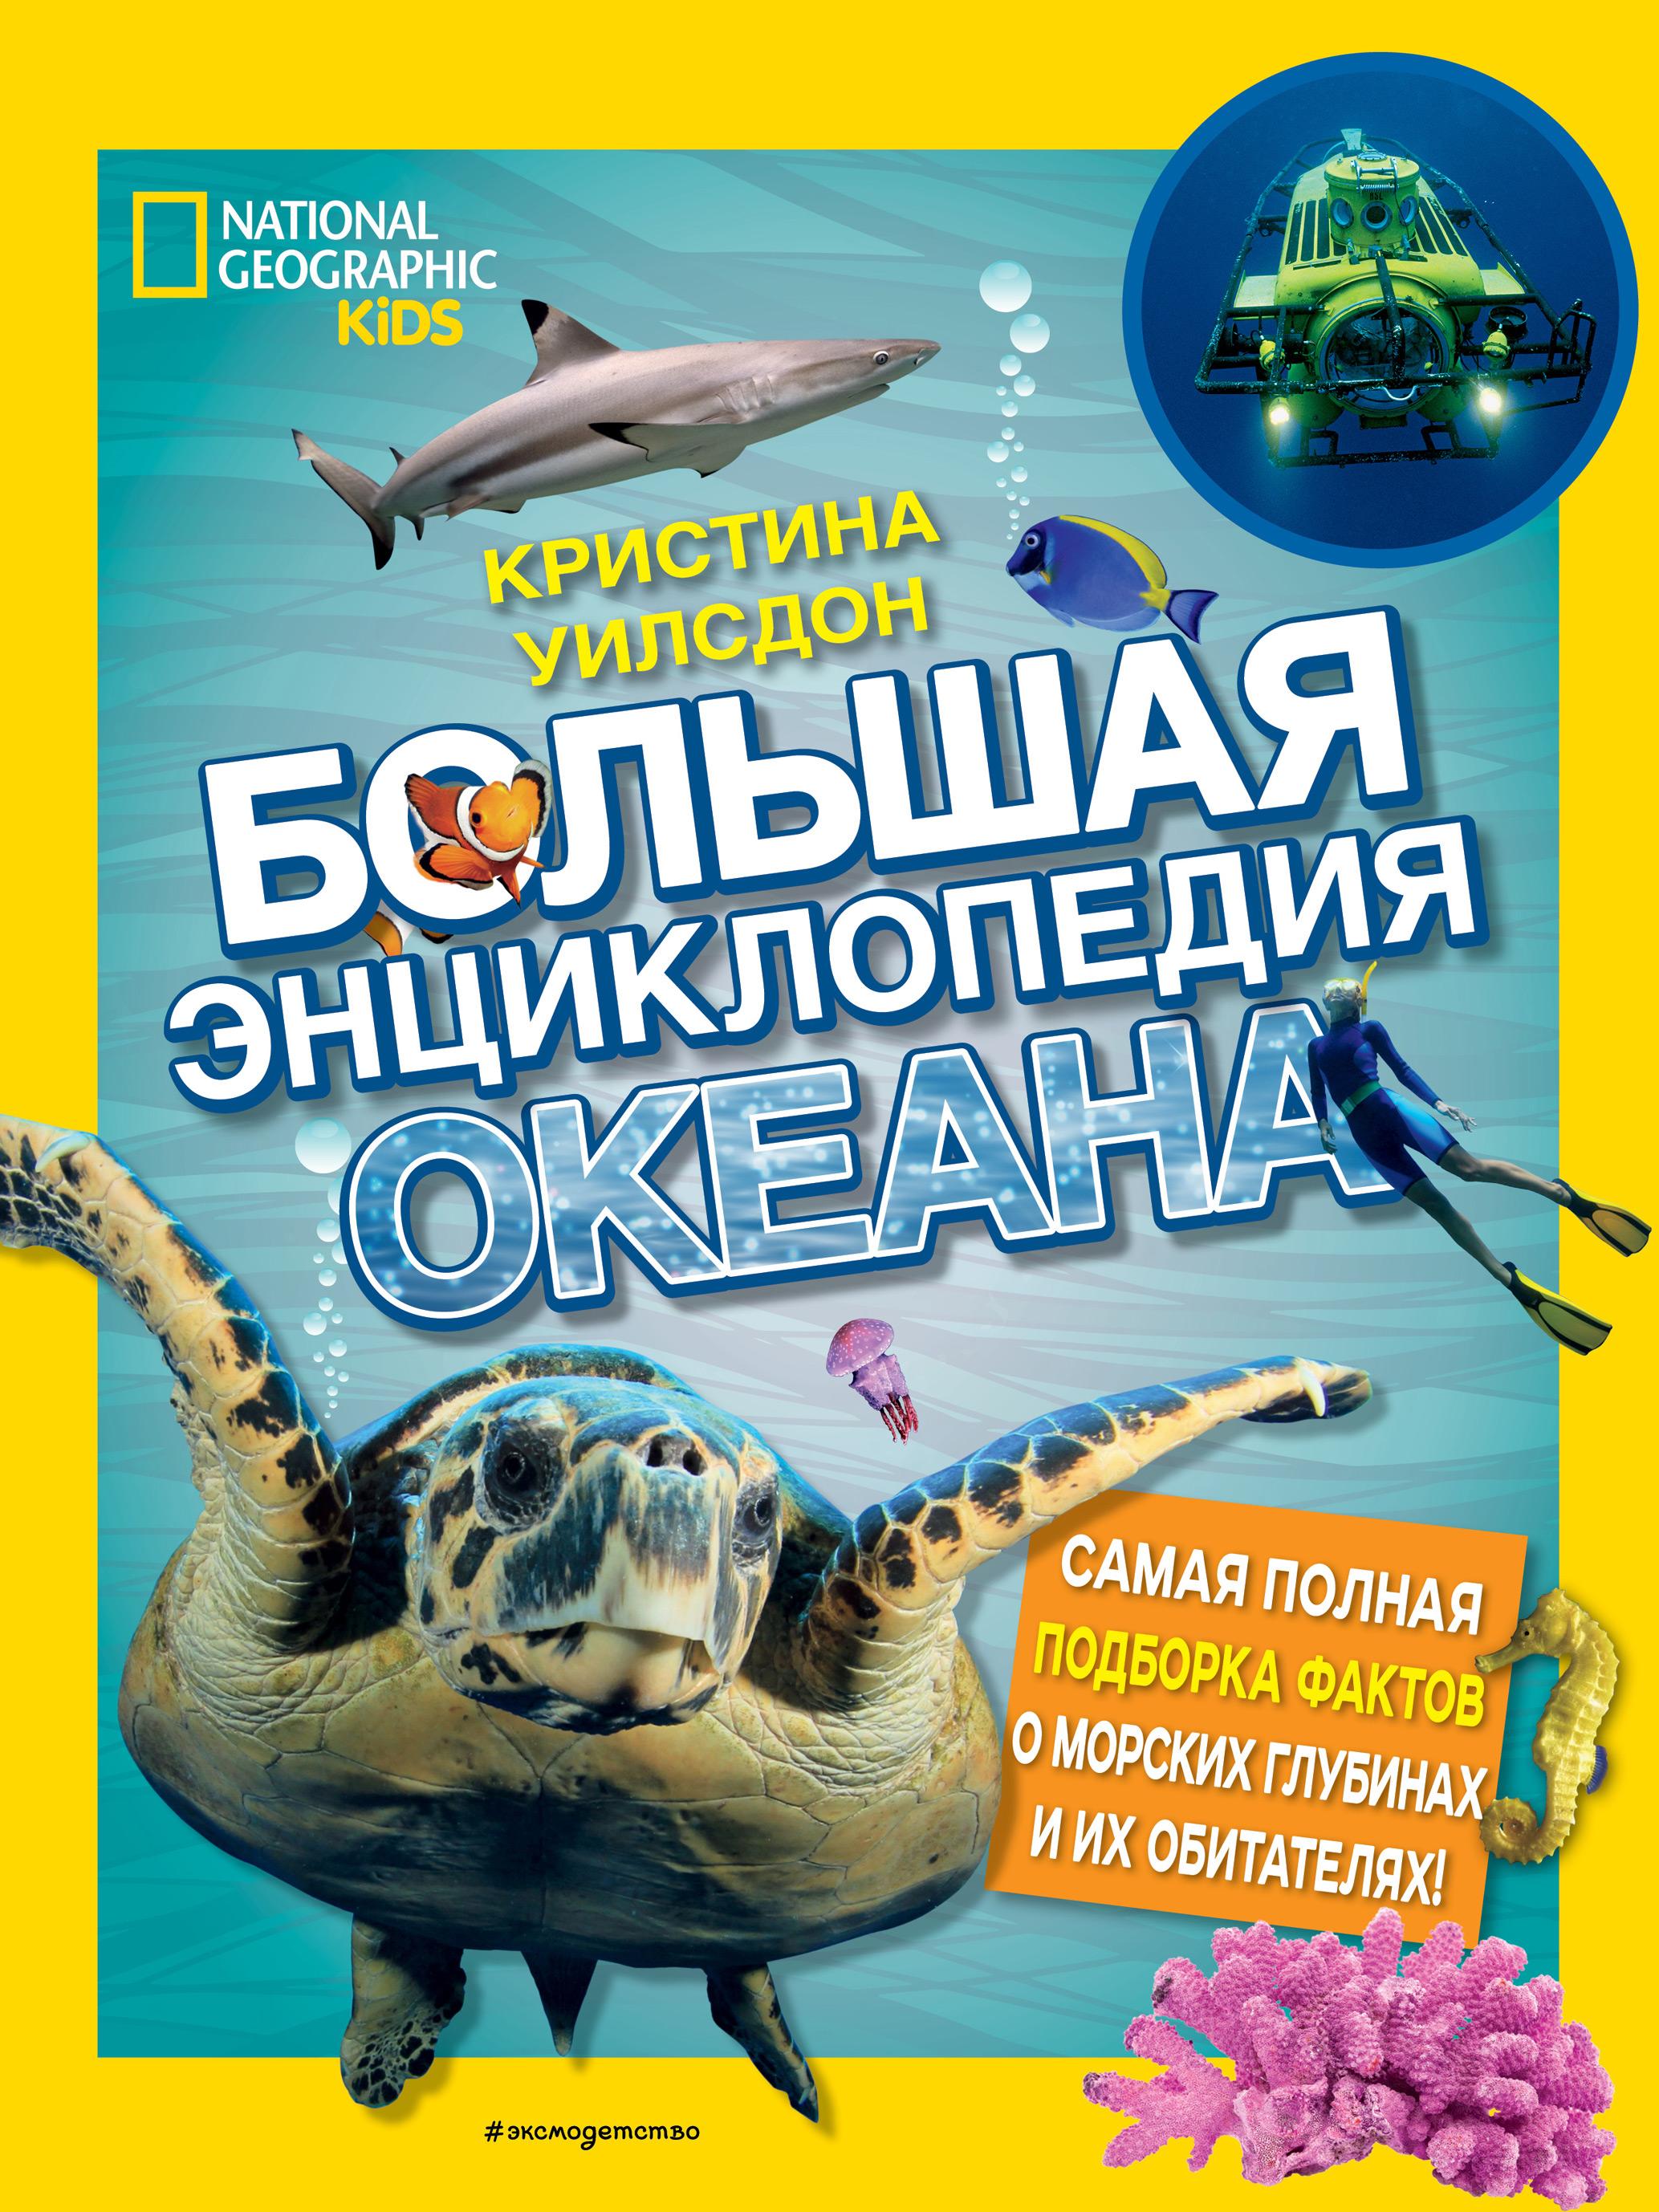 Кристина Уилсдон Большая энциклопедия океана